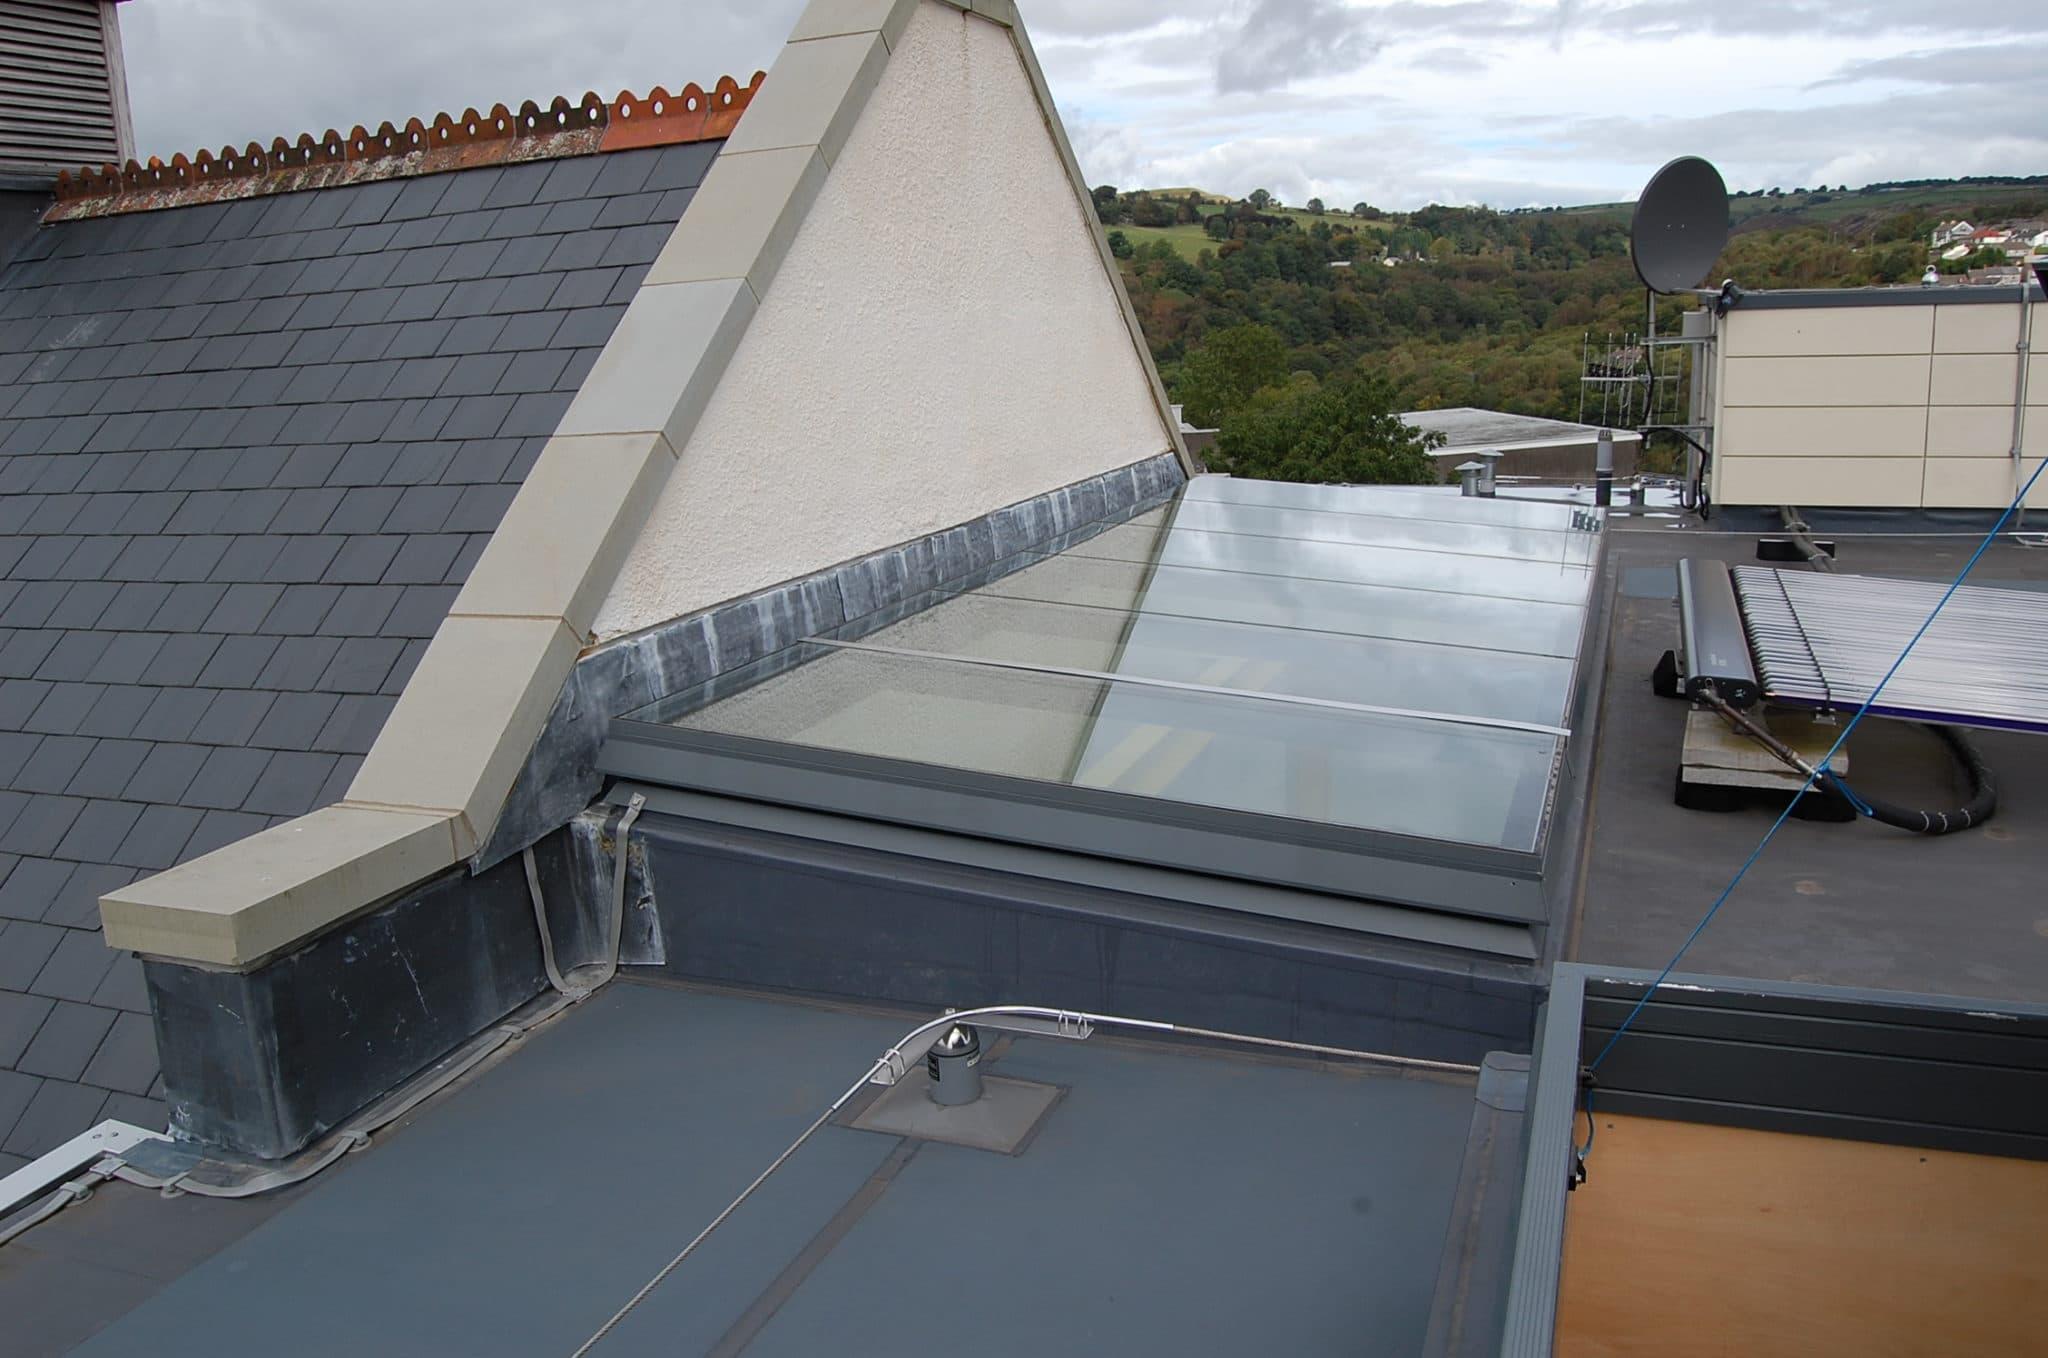 Groovy Świetliki dachowe szklane - bogata oferta Surespan Access & Escape YH96